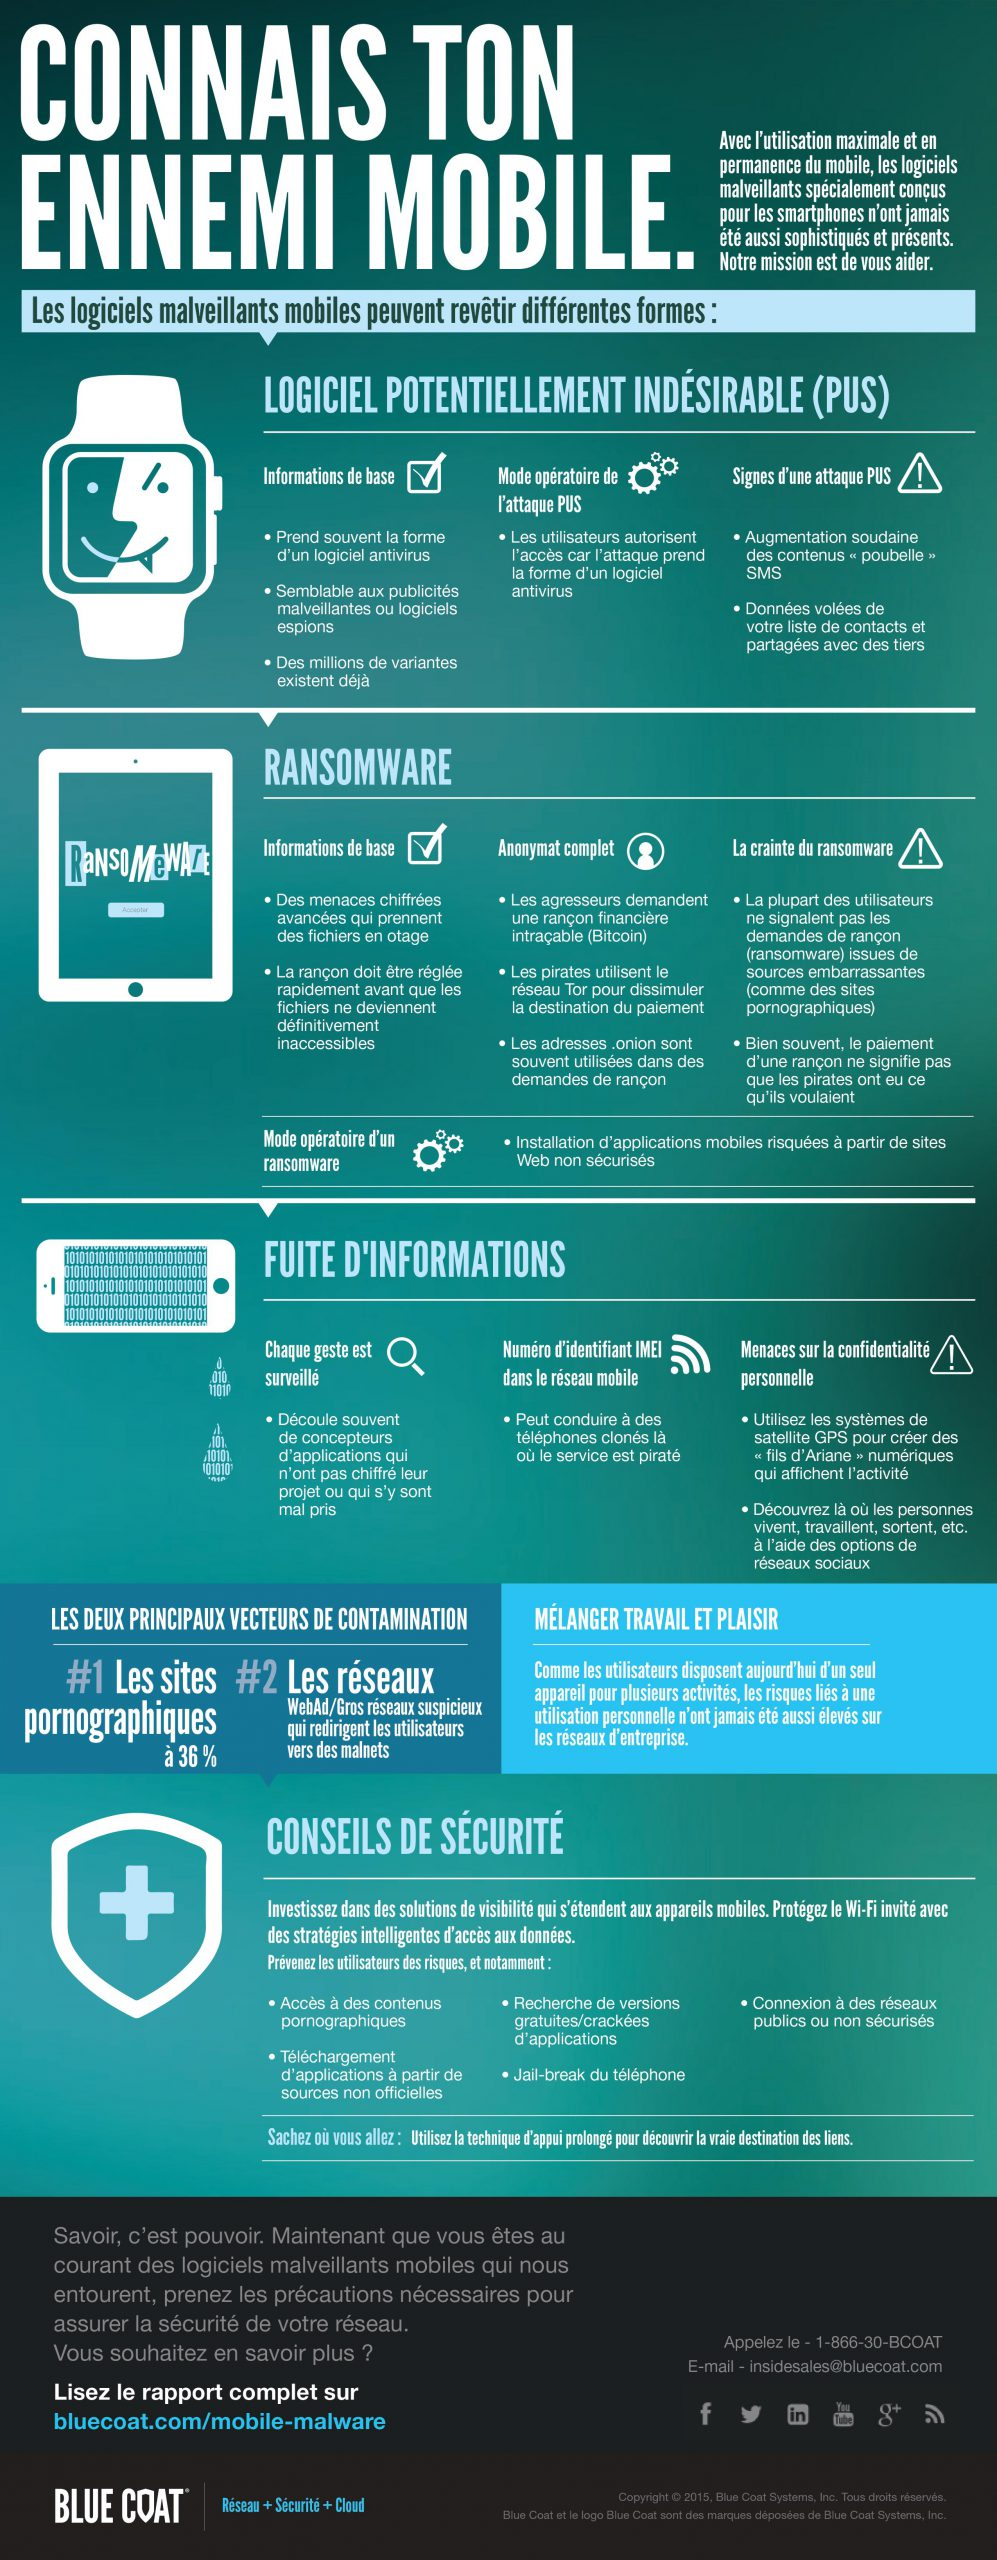 2015 MobileMalware Report_HD